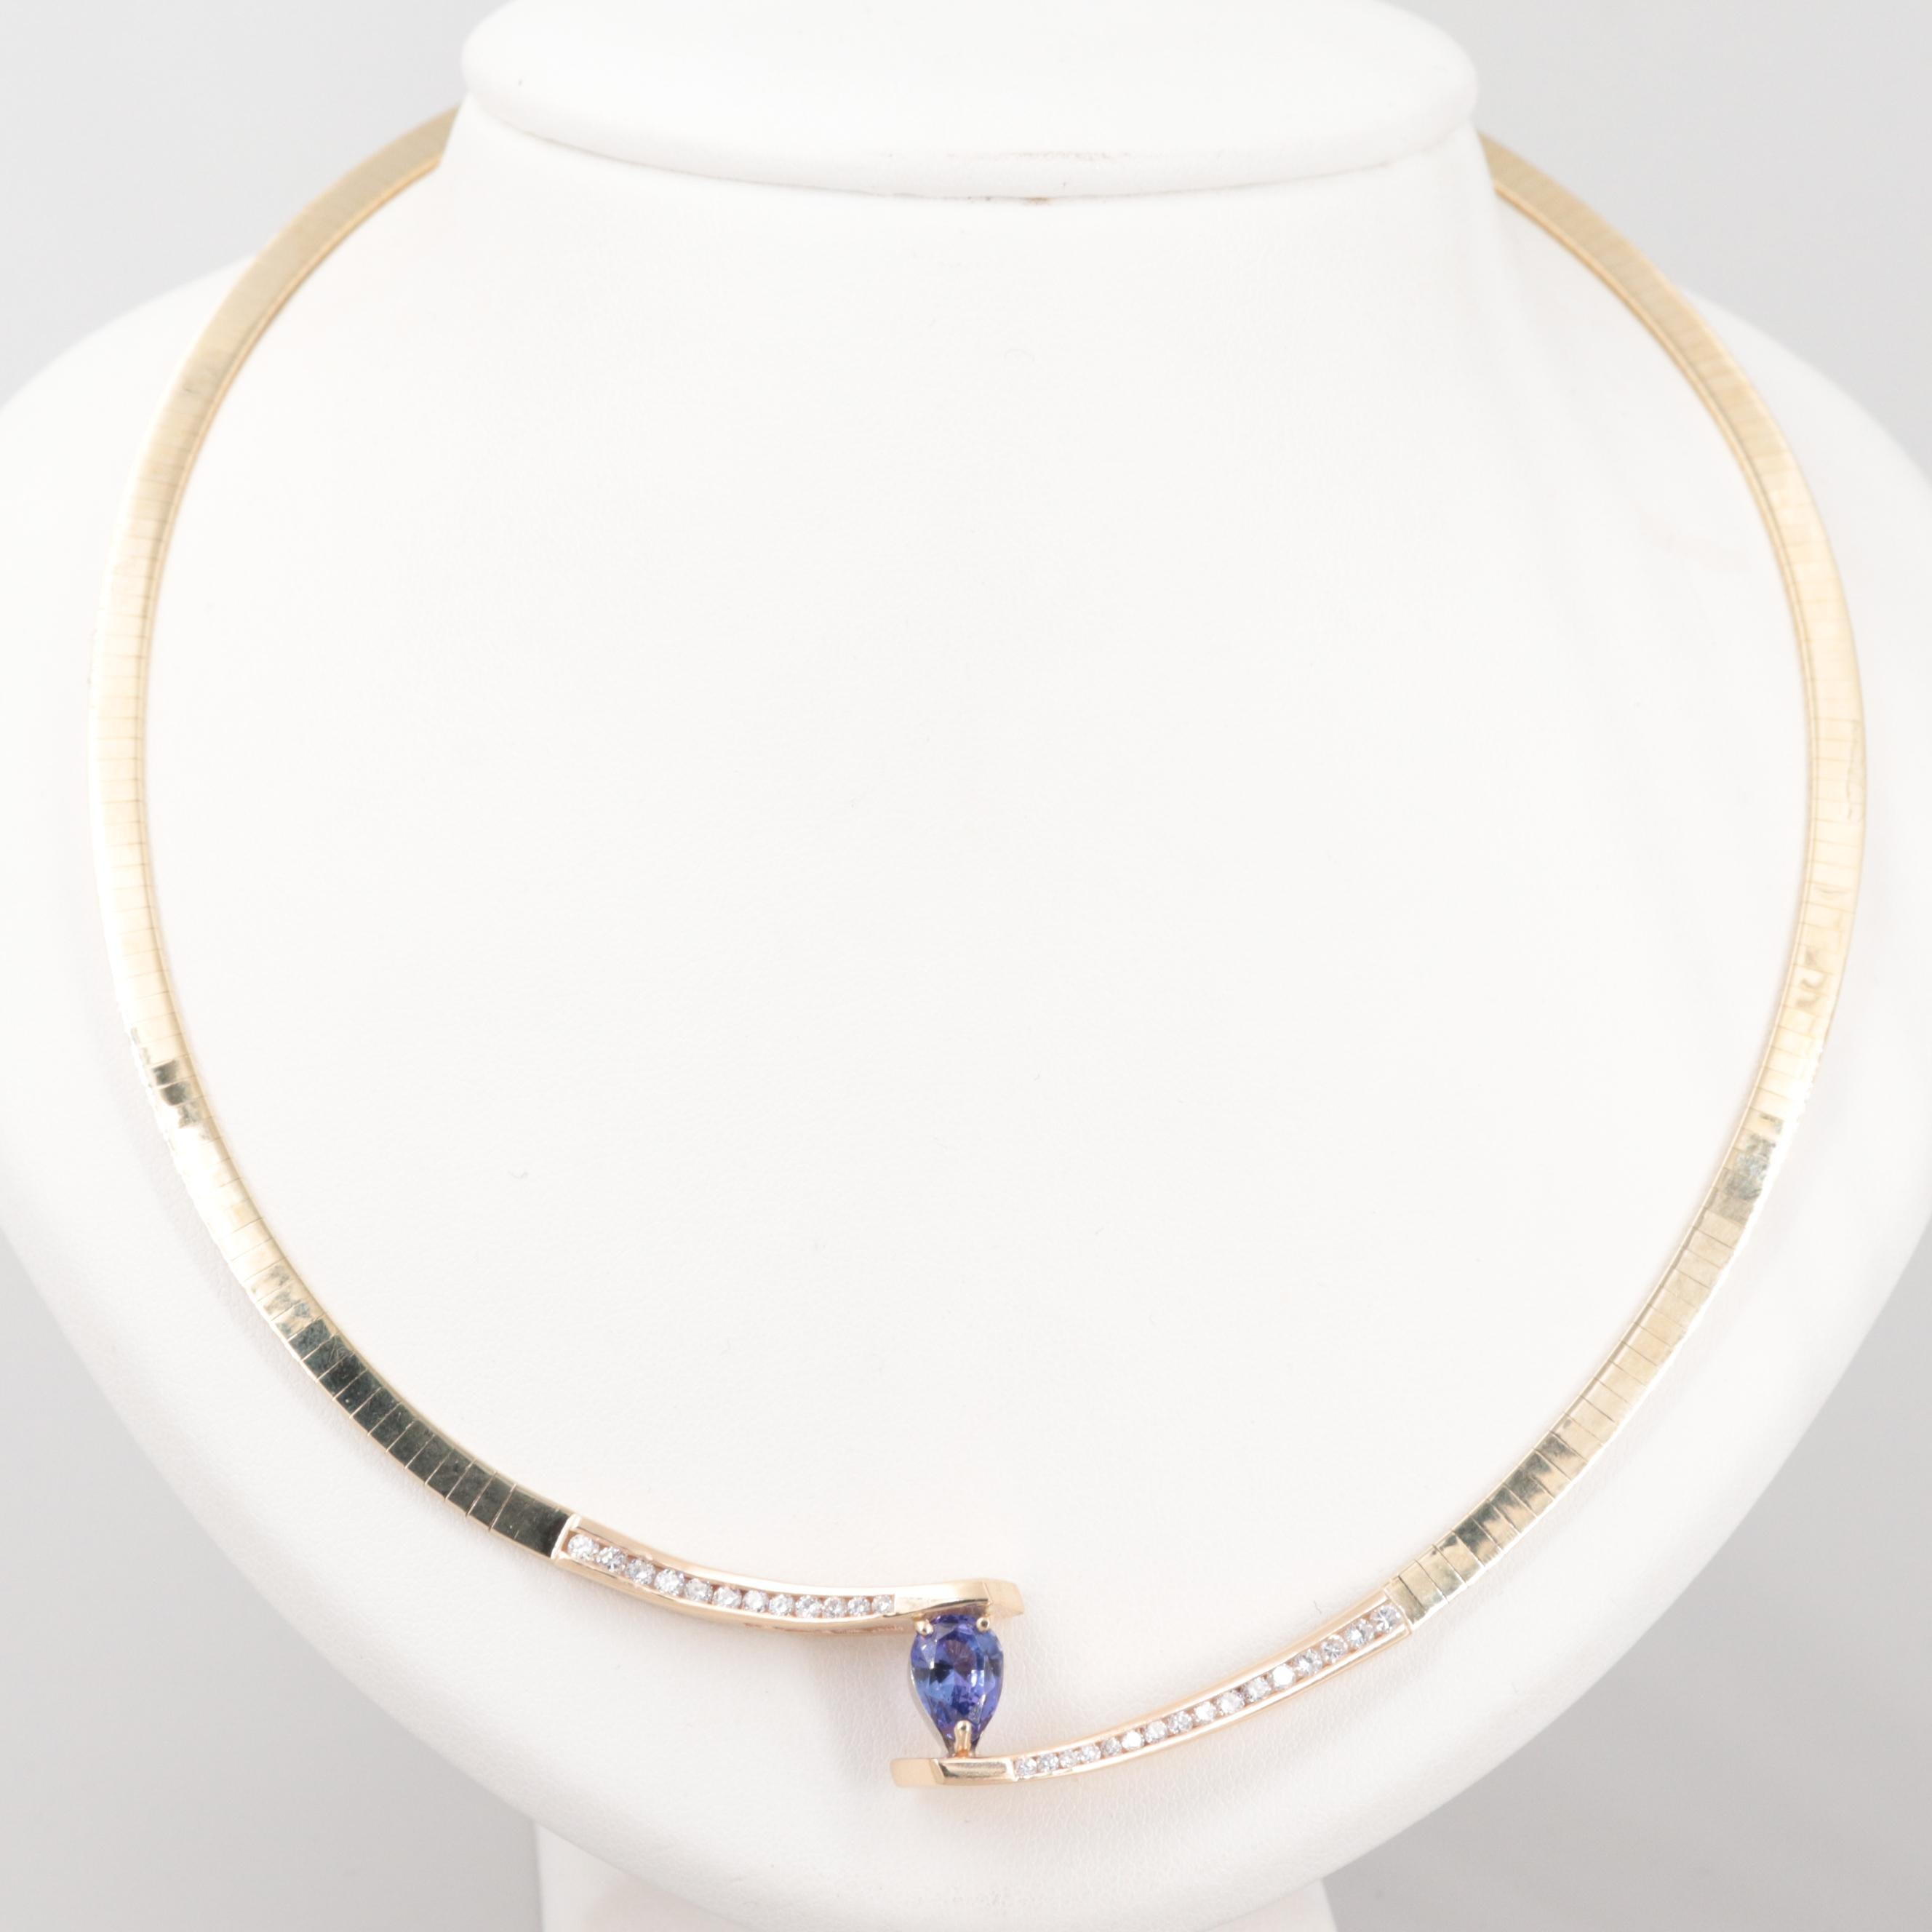 14K Yellow Gold 1.84 CT Tanzanite and Diamond Omega Collar Necklace